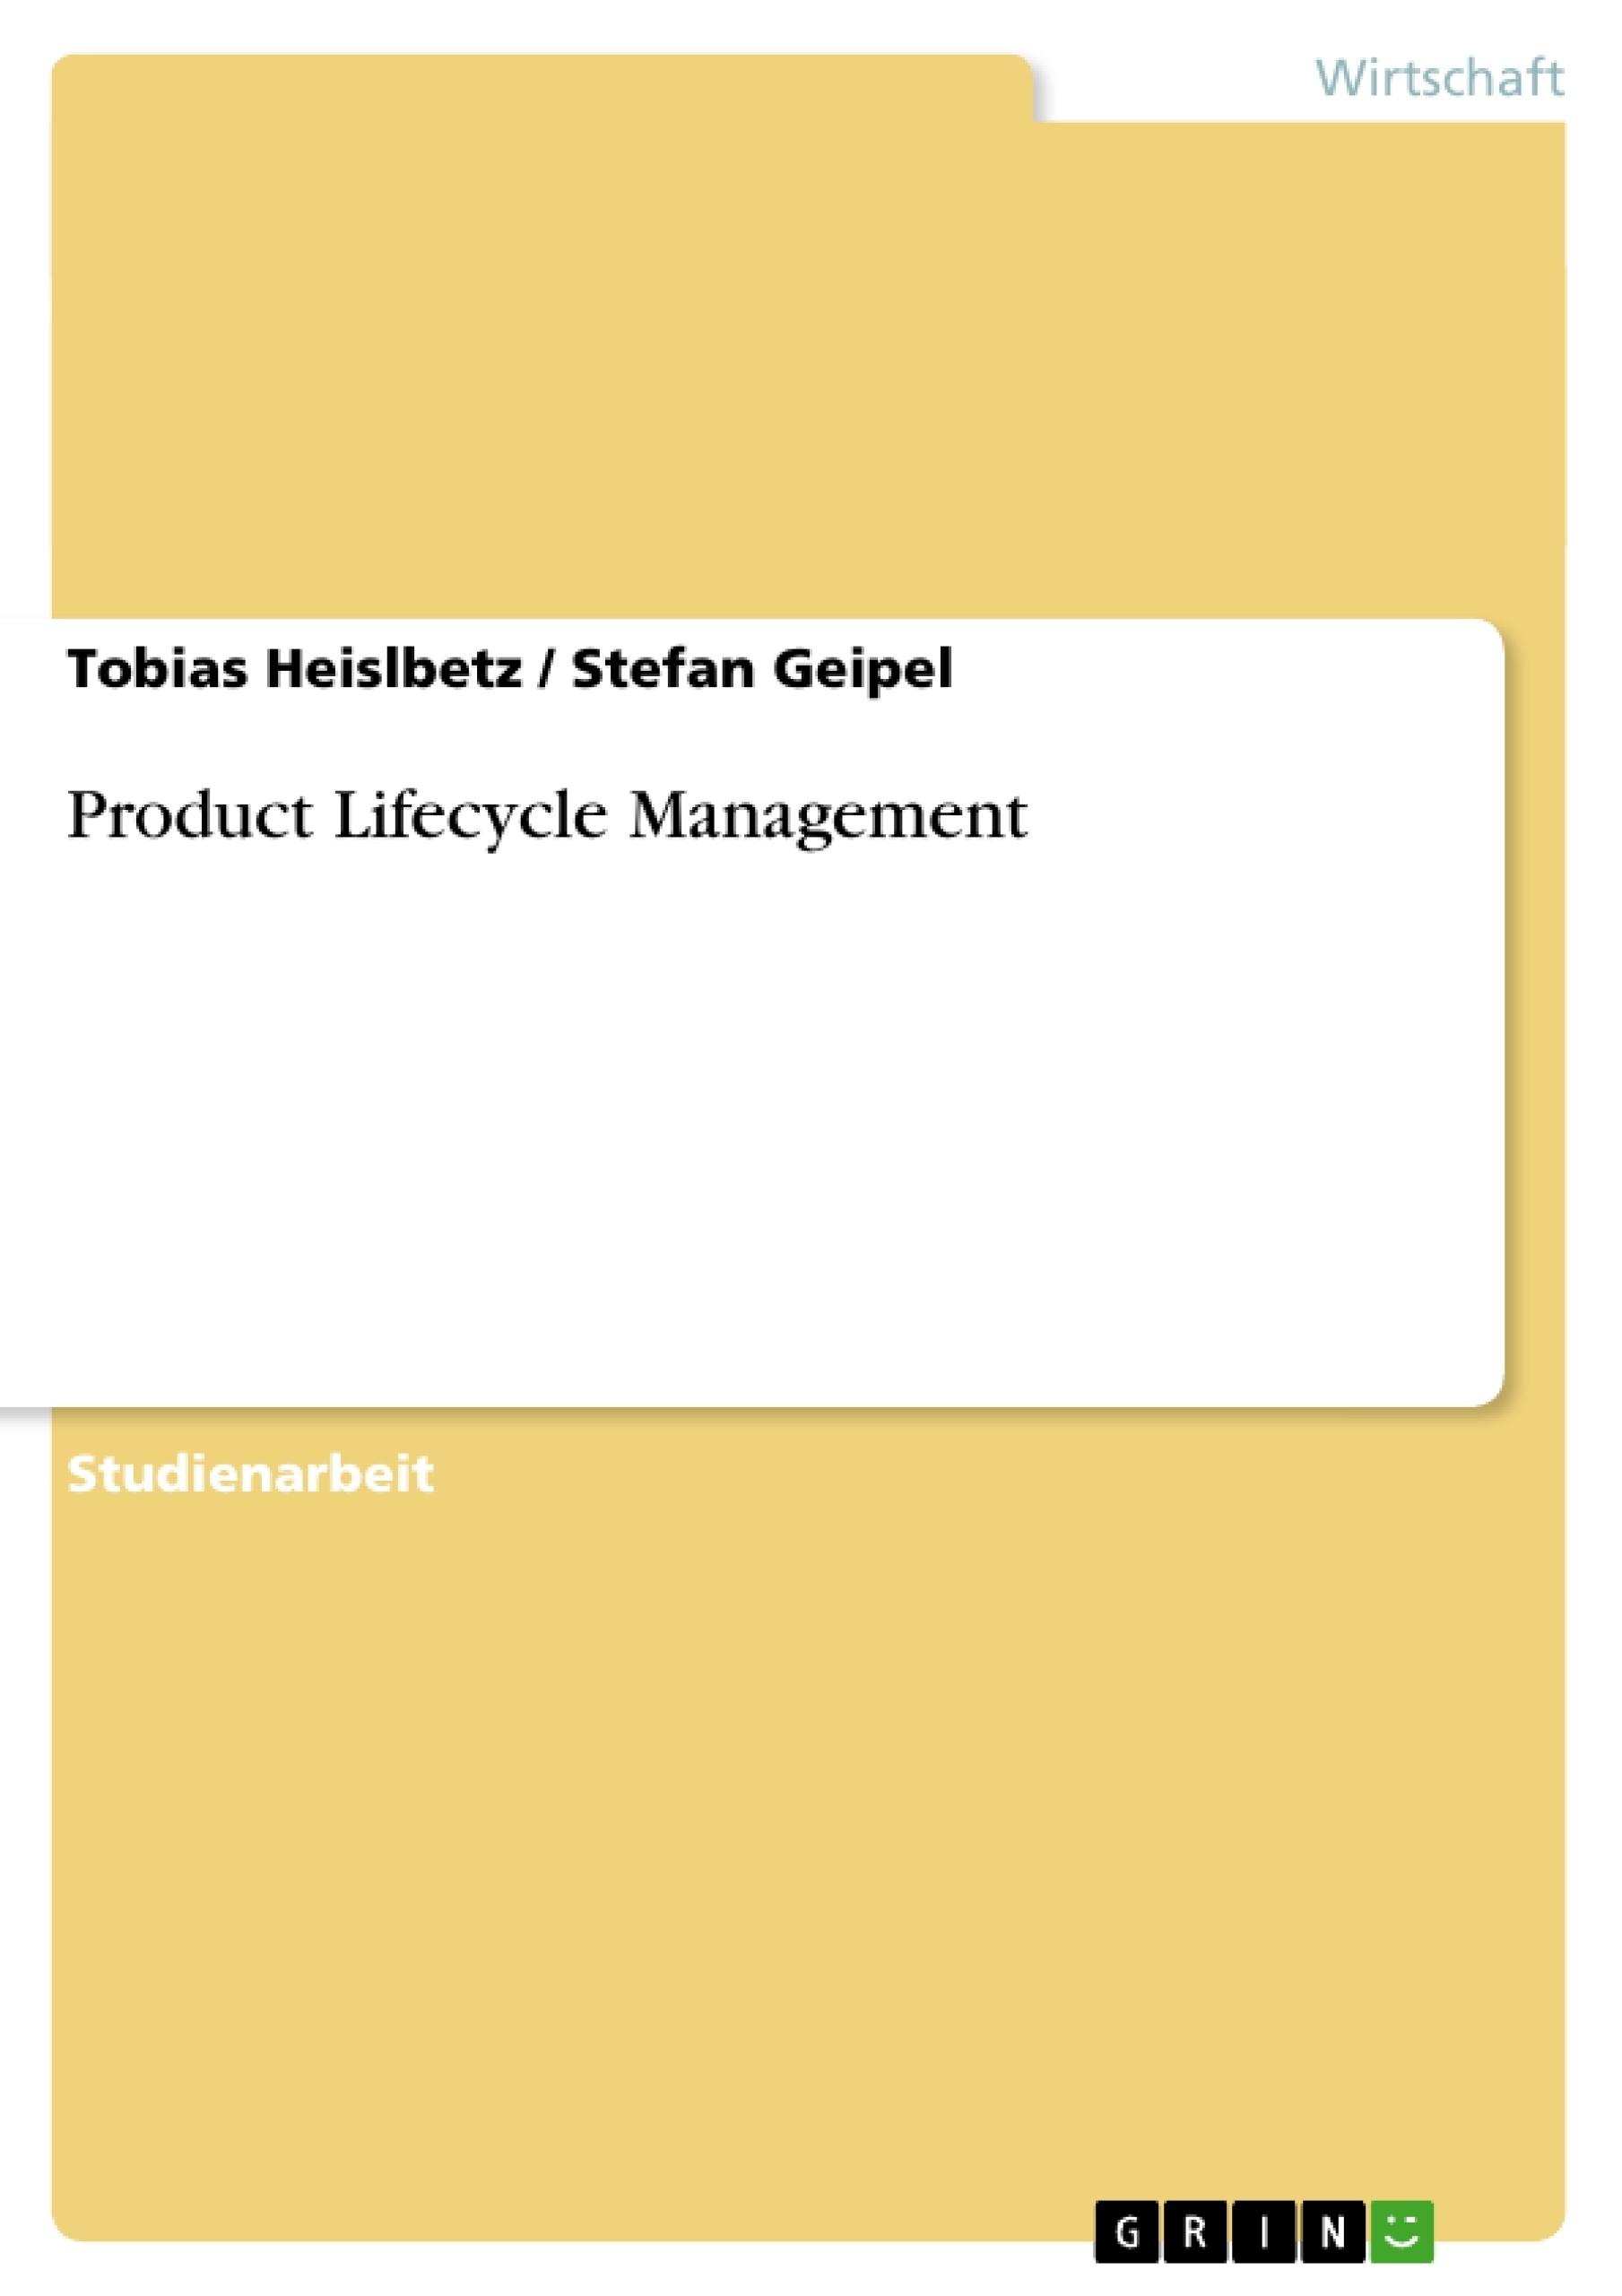 Titel: Product Lifecycle Management